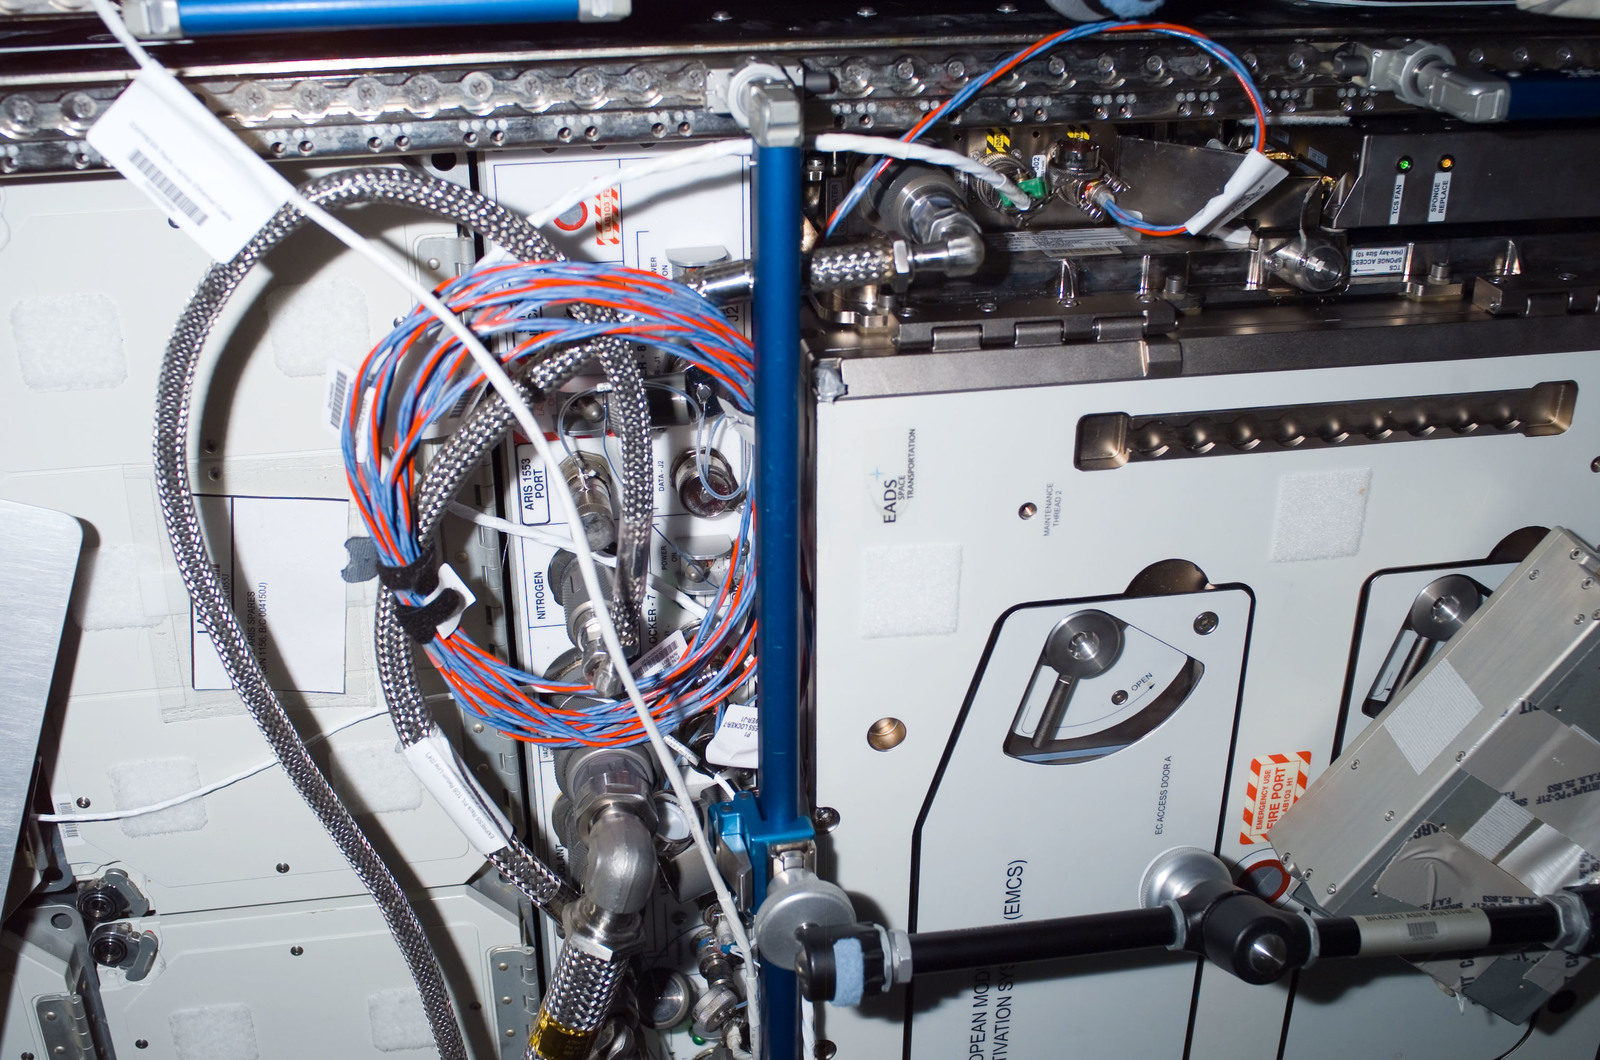 S120E008259 - STS-120 - Hoses on racks in Destiny module